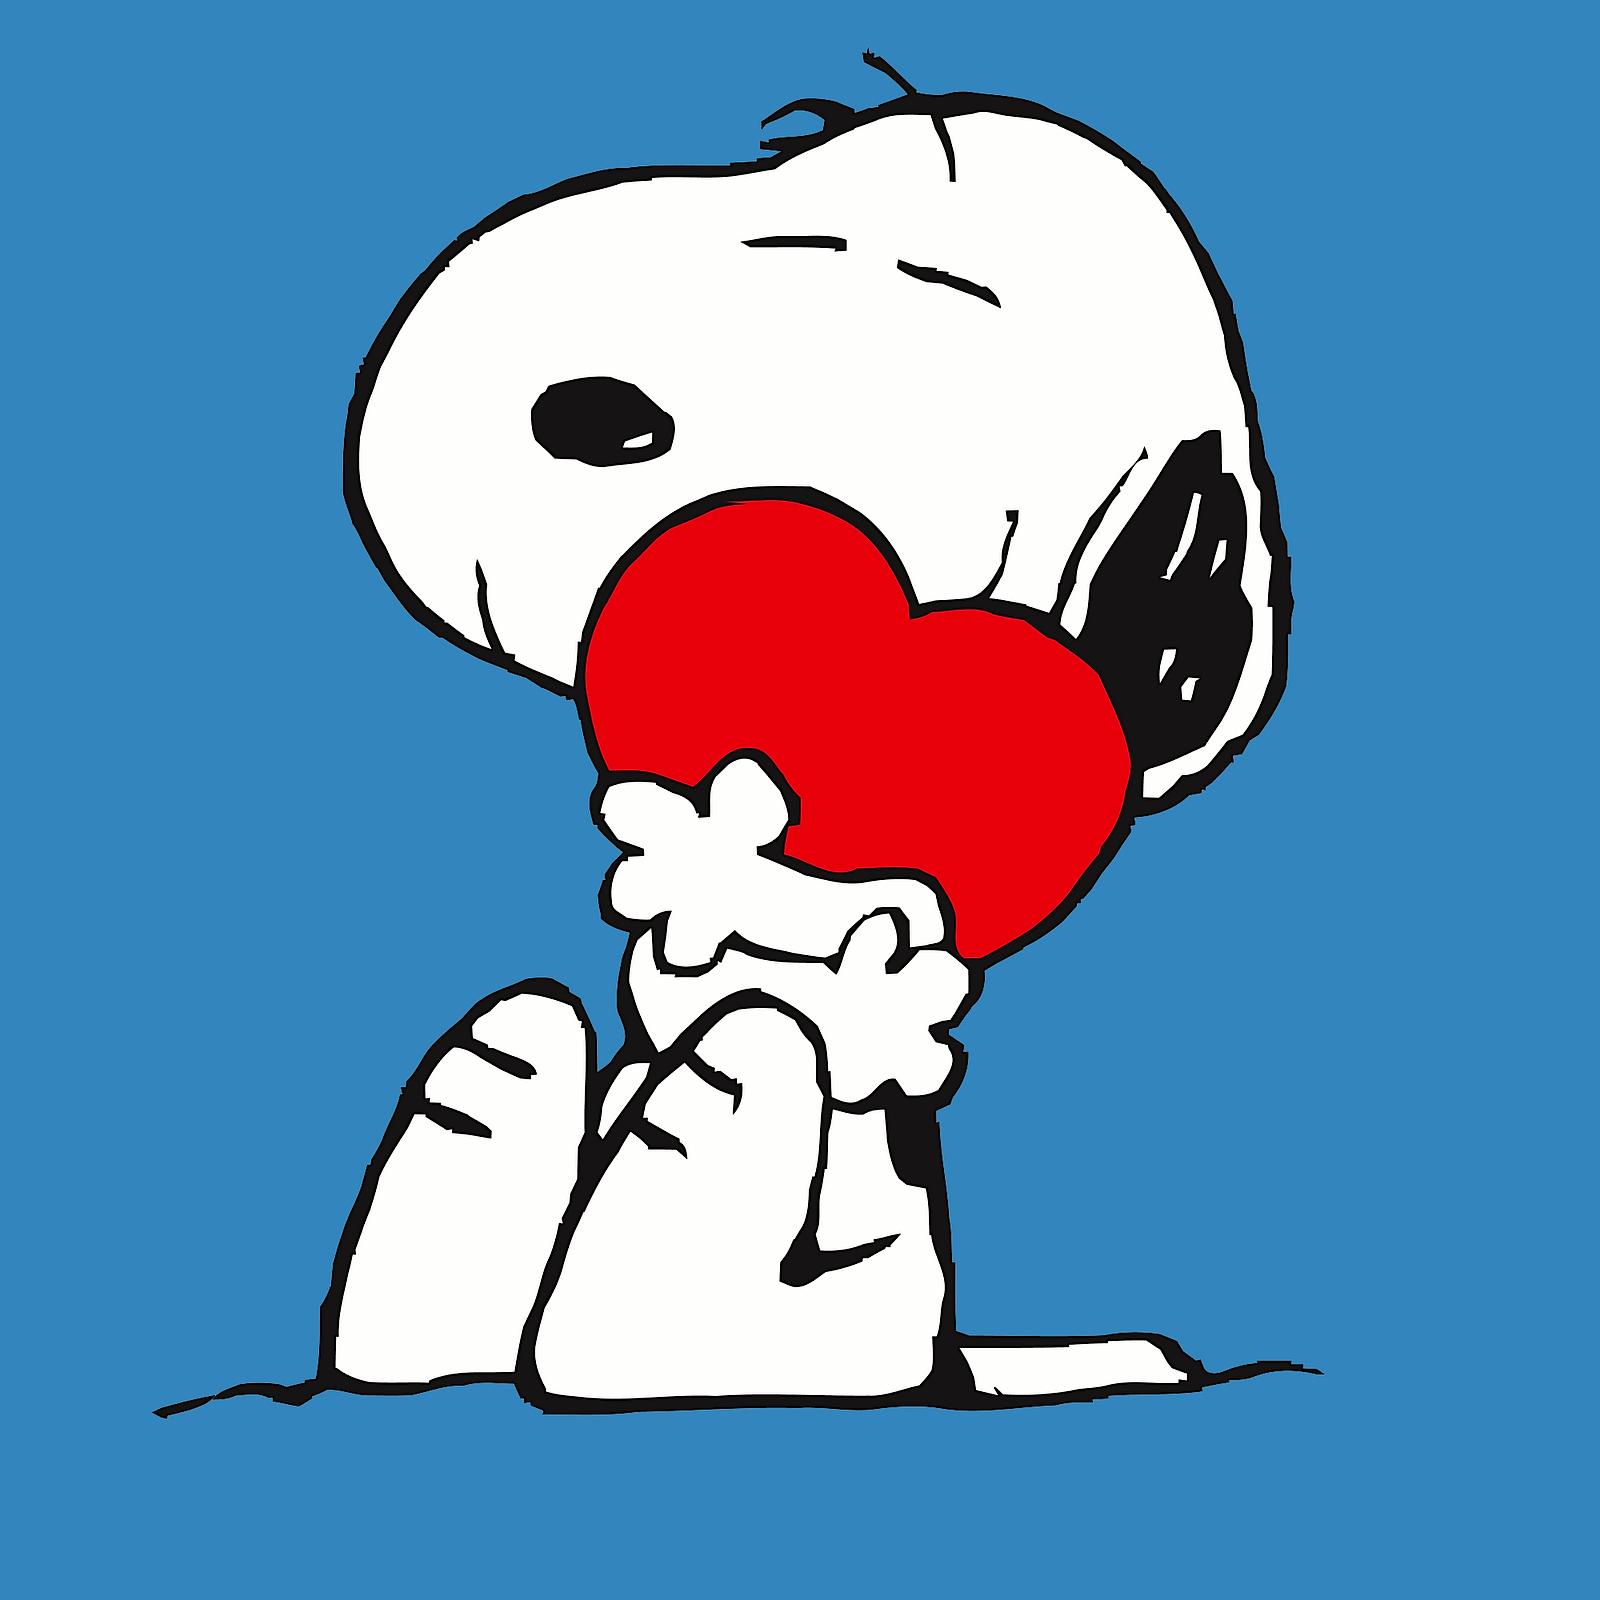 Snoopy_shultz_love